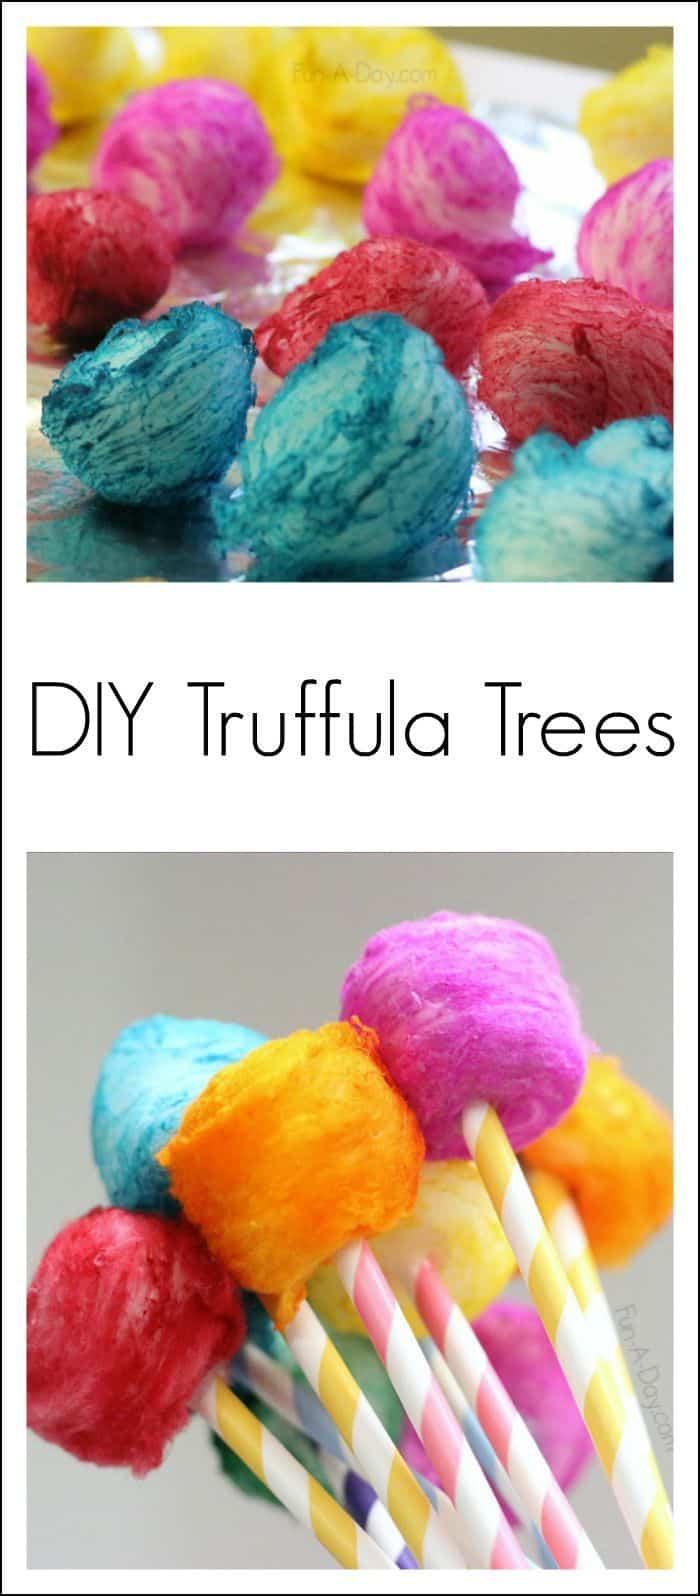 Diy trufula trees